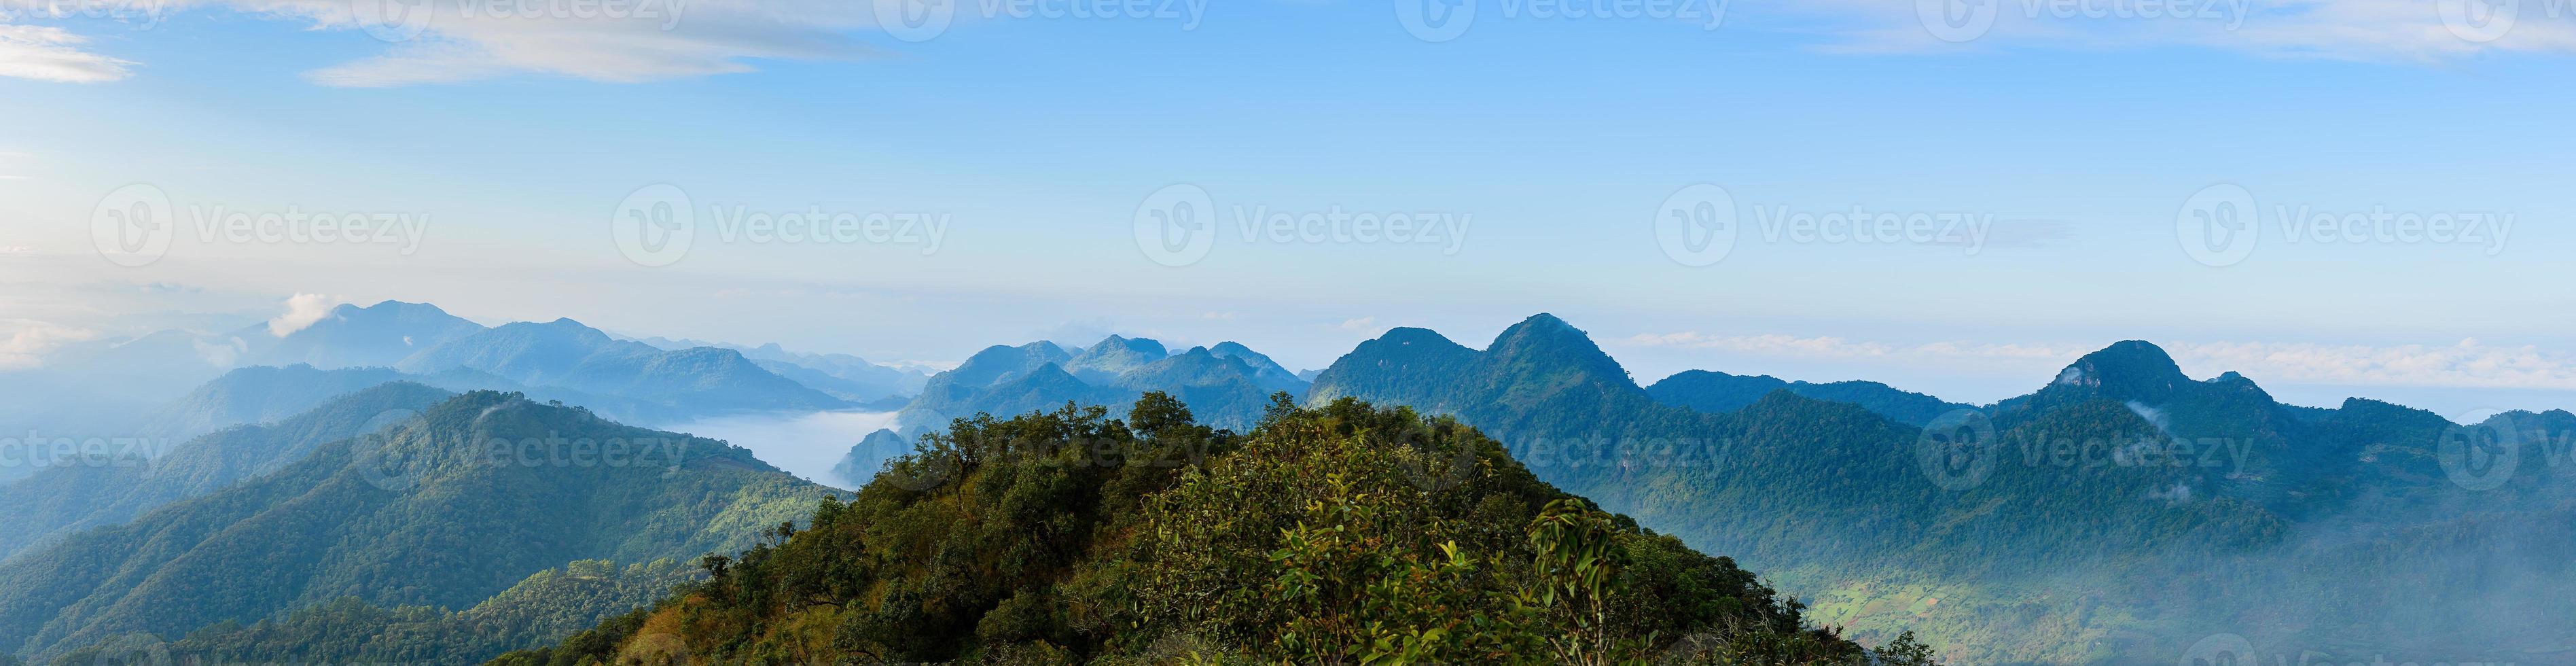 blauwe bergen in de mist foto